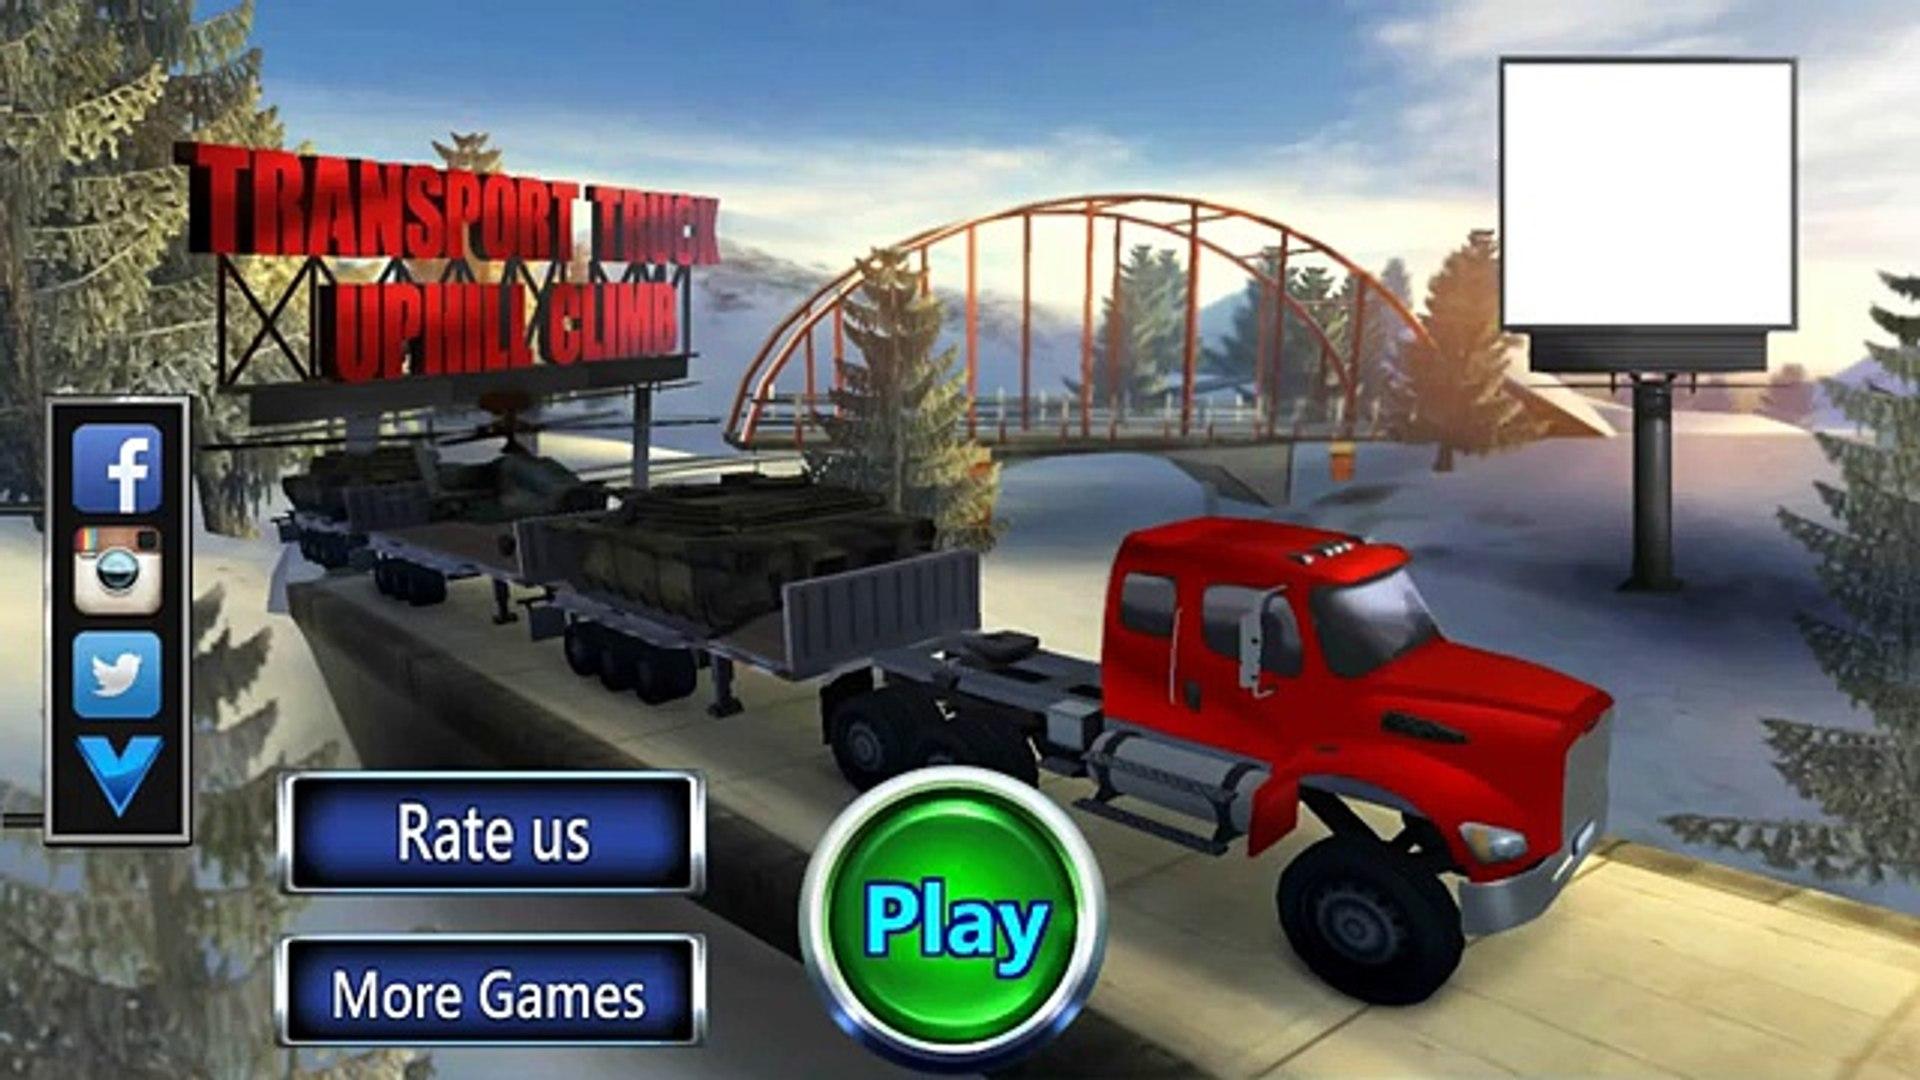 Транспорт грузовик восхождение на андроид геймплей HD